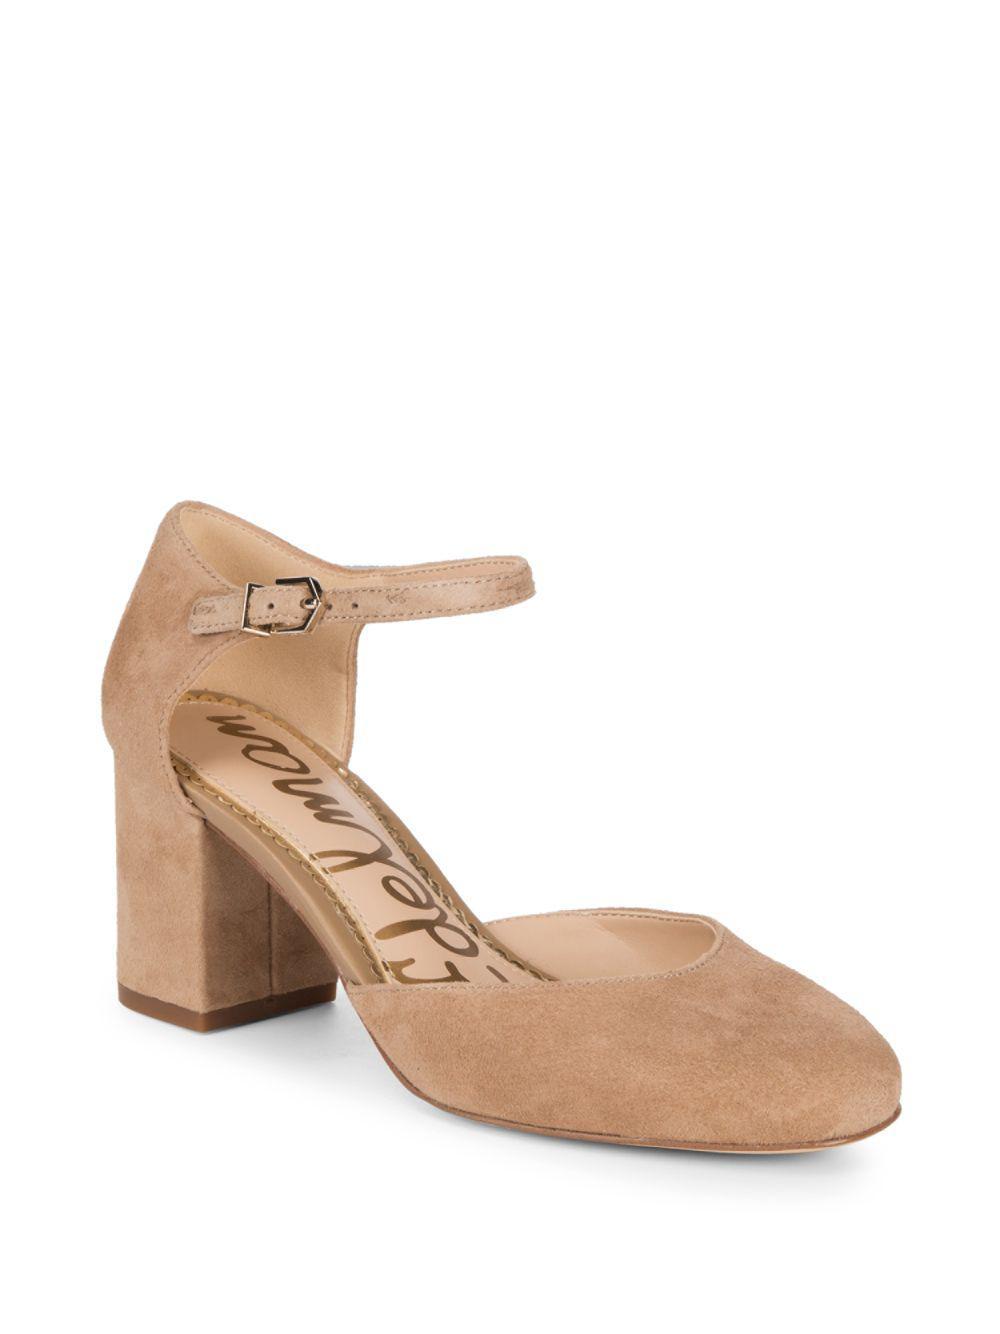 3556e6643 Lyst - Sam Edelman Clover Ankle-strap Pumps in Natural